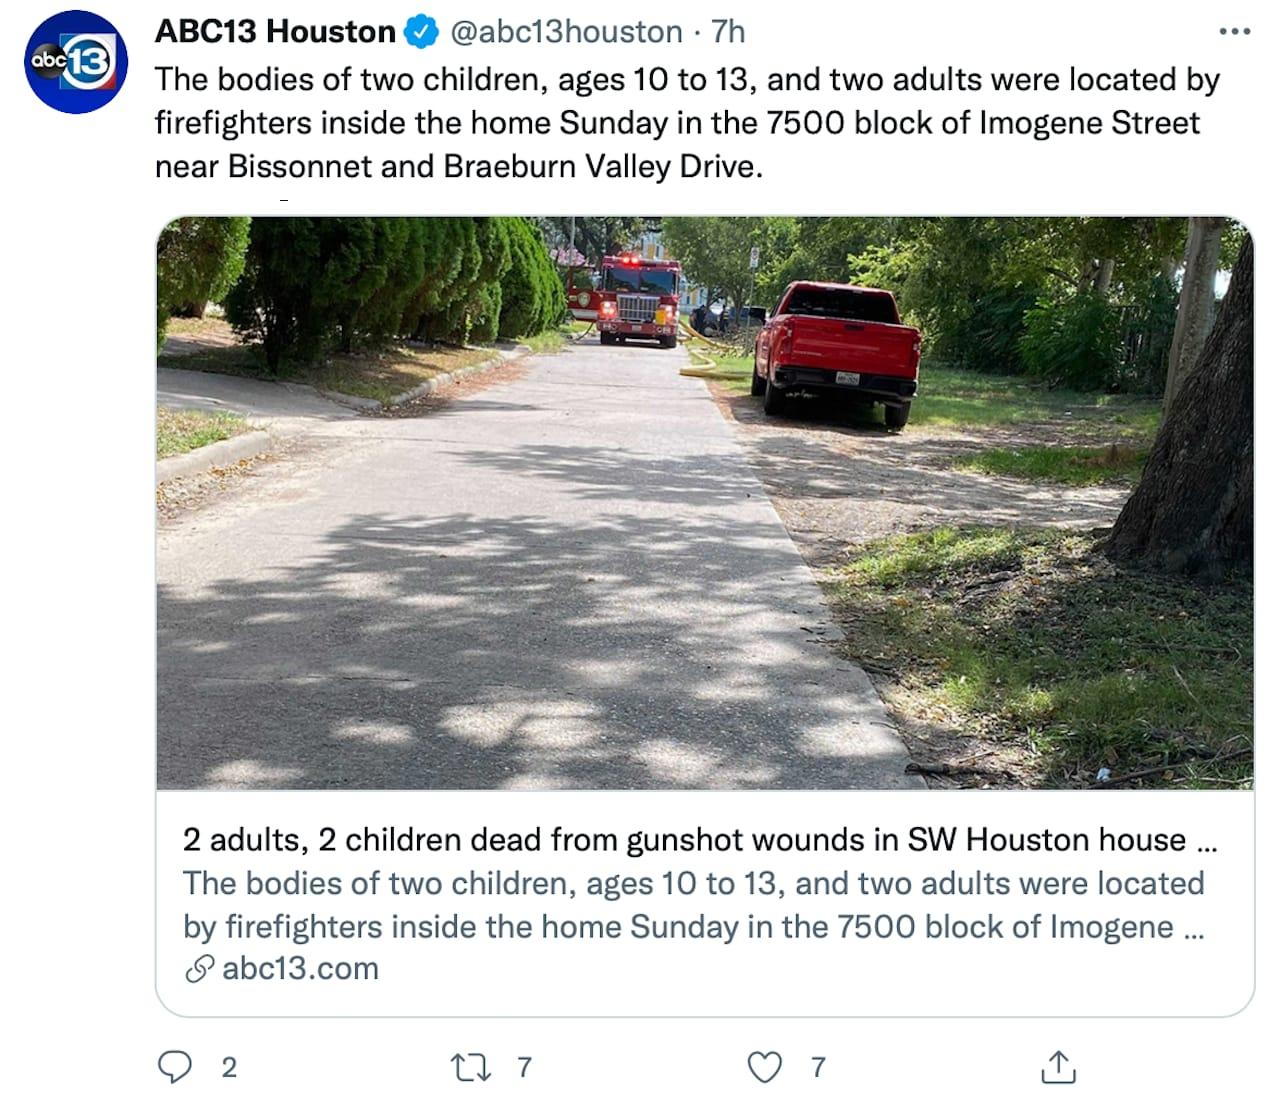 The tragedy of firearm deaths